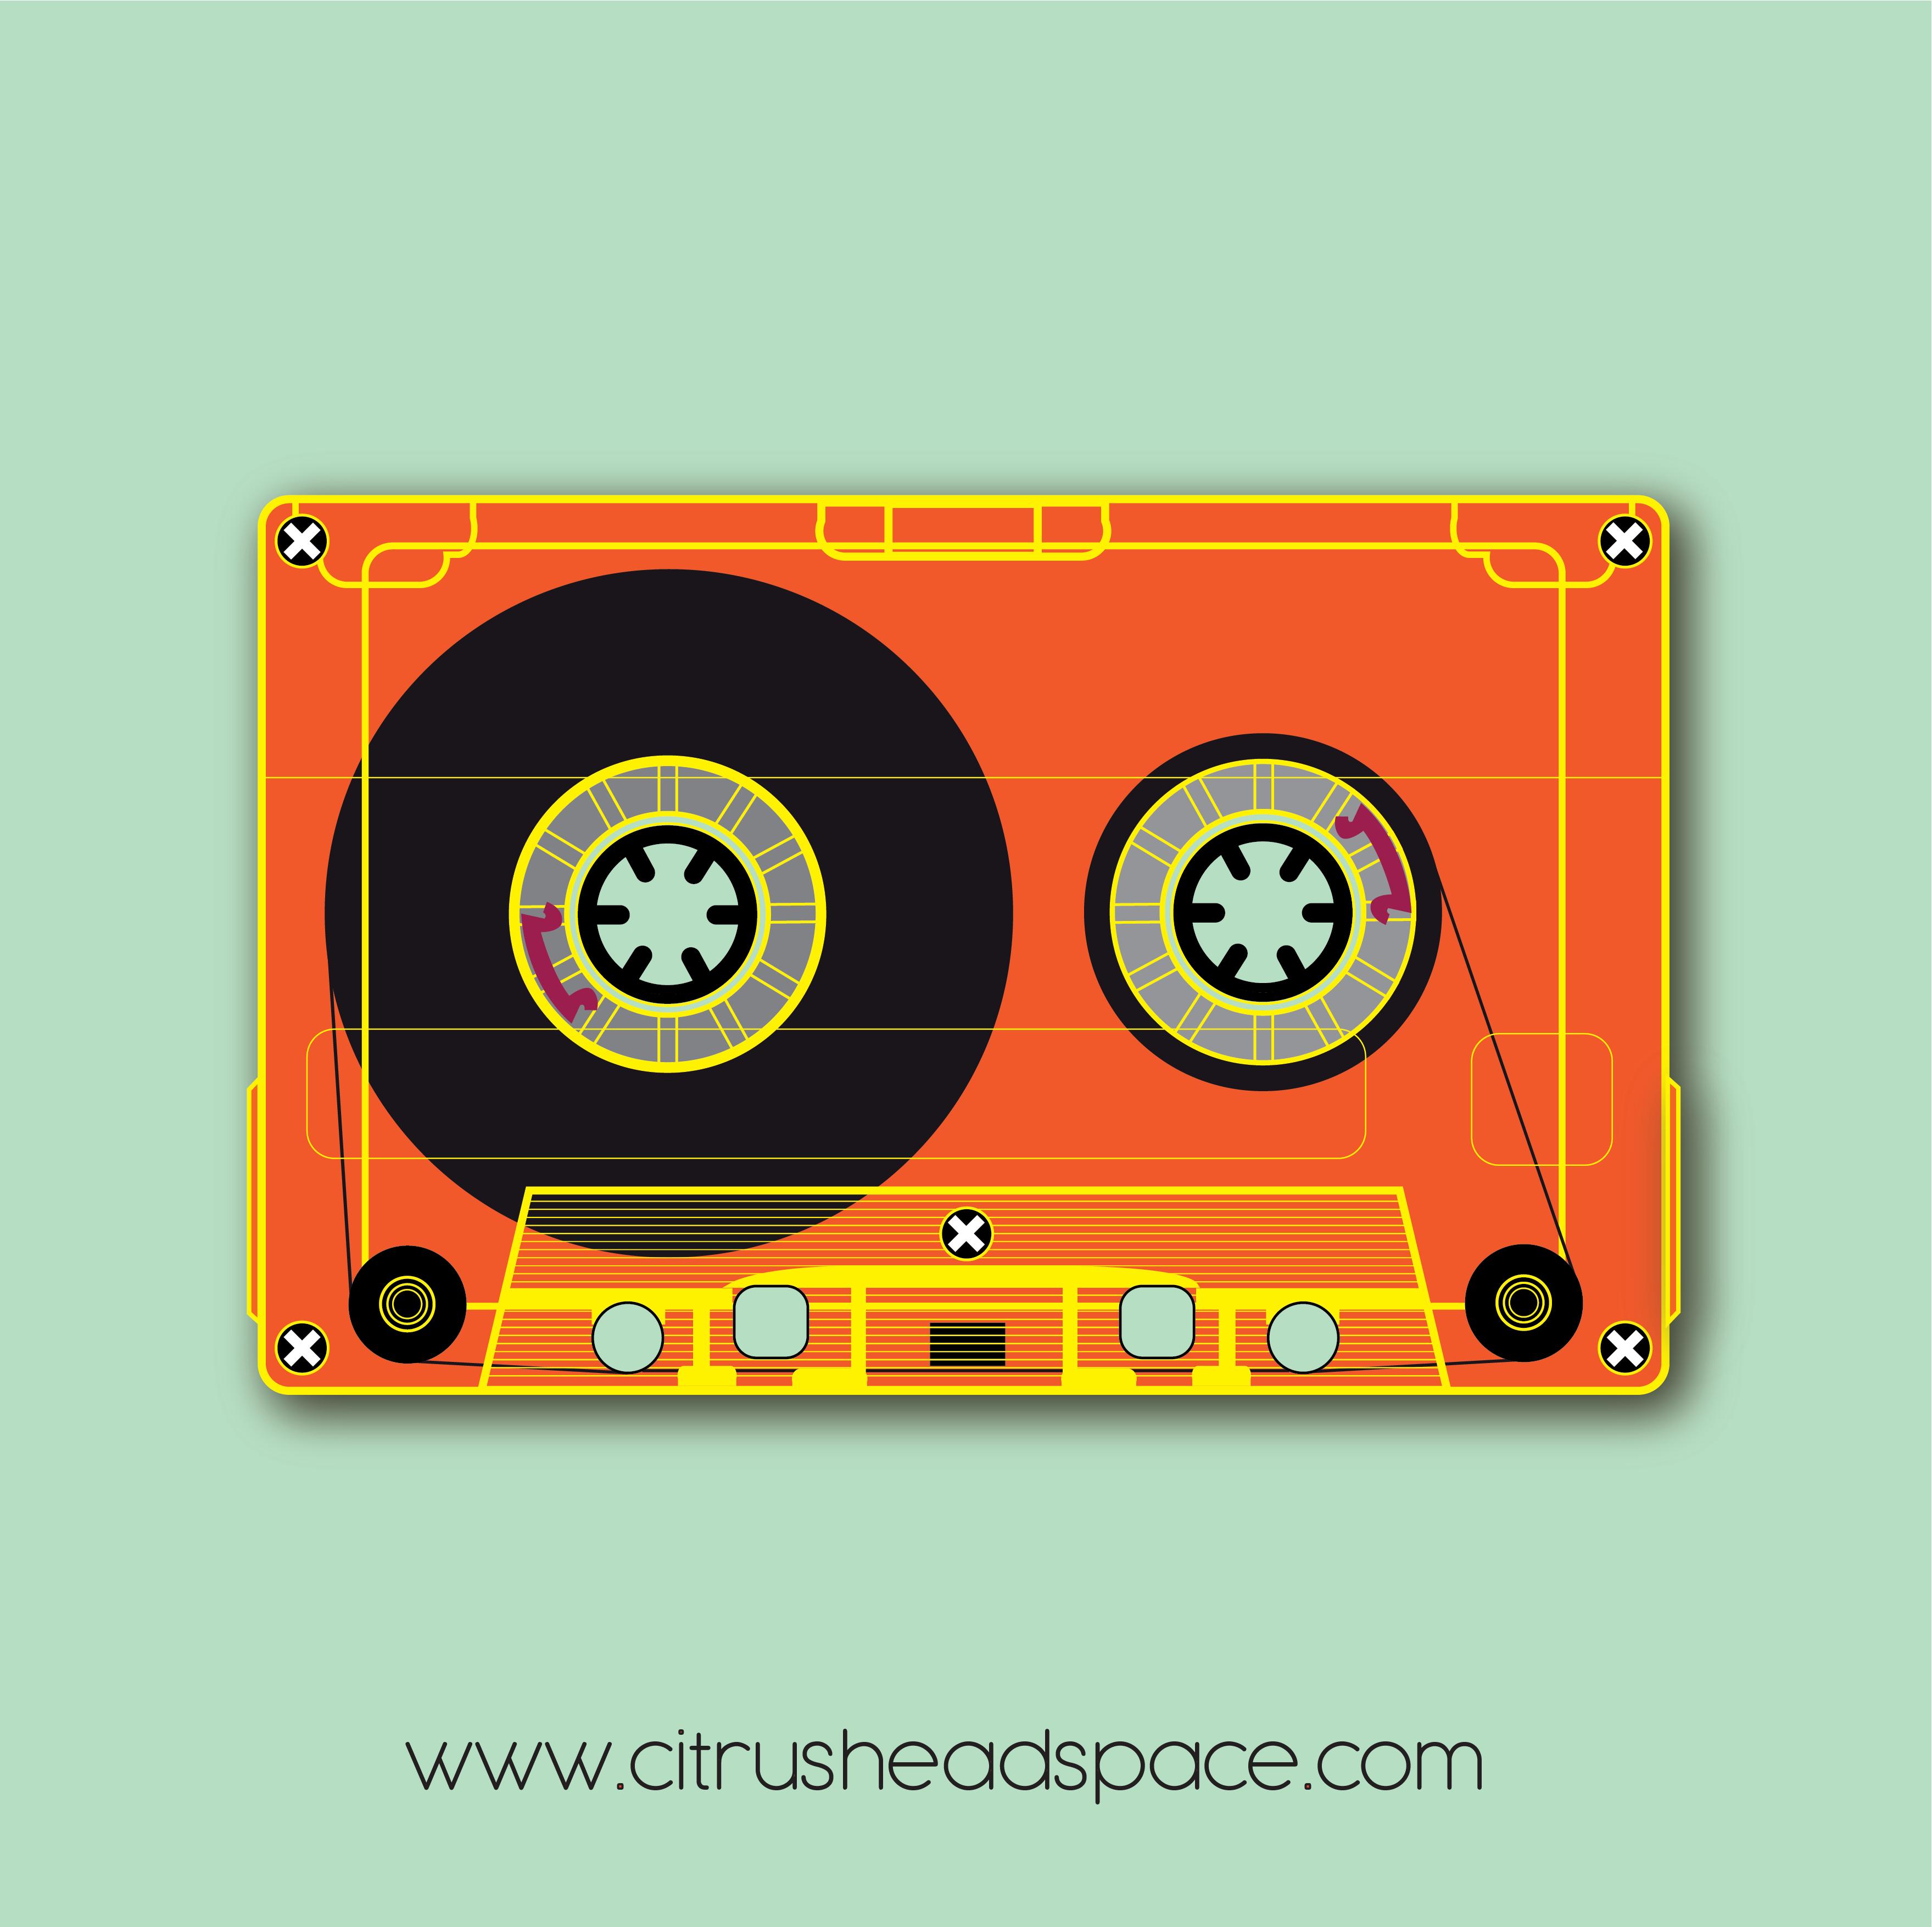 Audio Cassette Tape Audio Cassette Tapes Audio Cassette Cassette Tapes